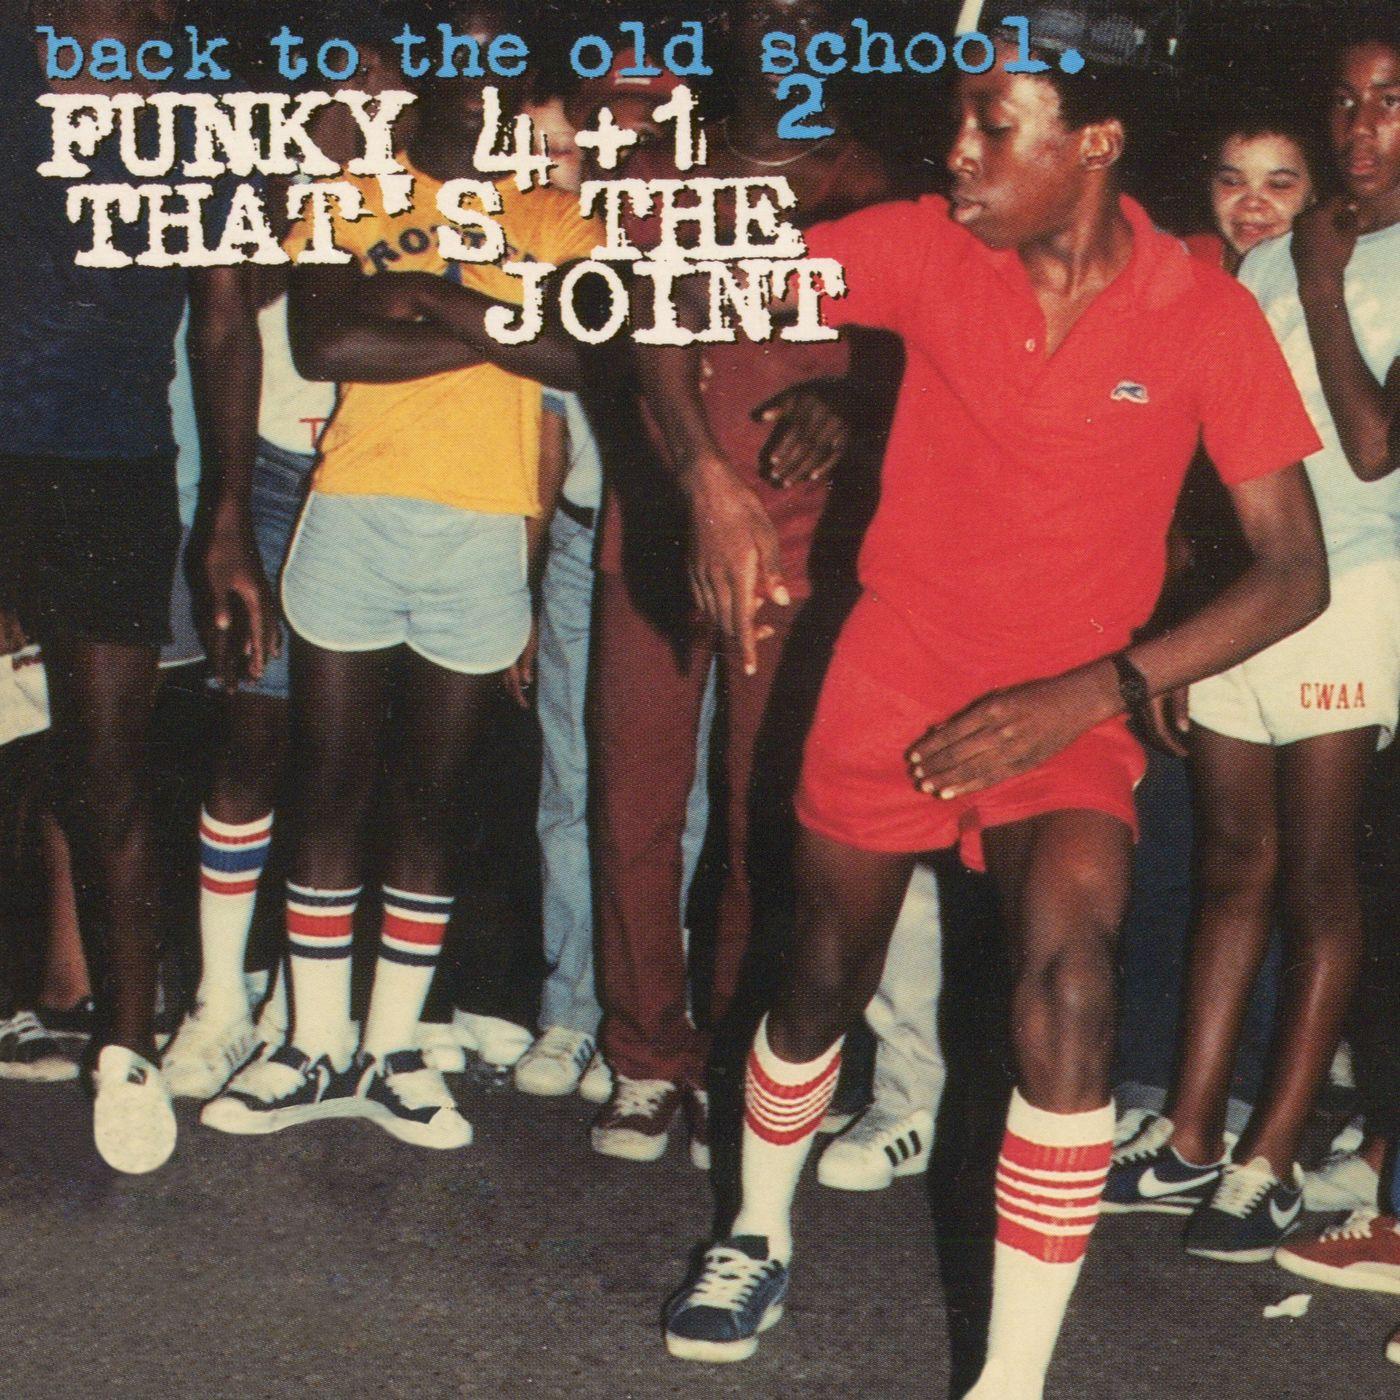 Funky 4+1 - King Heroin